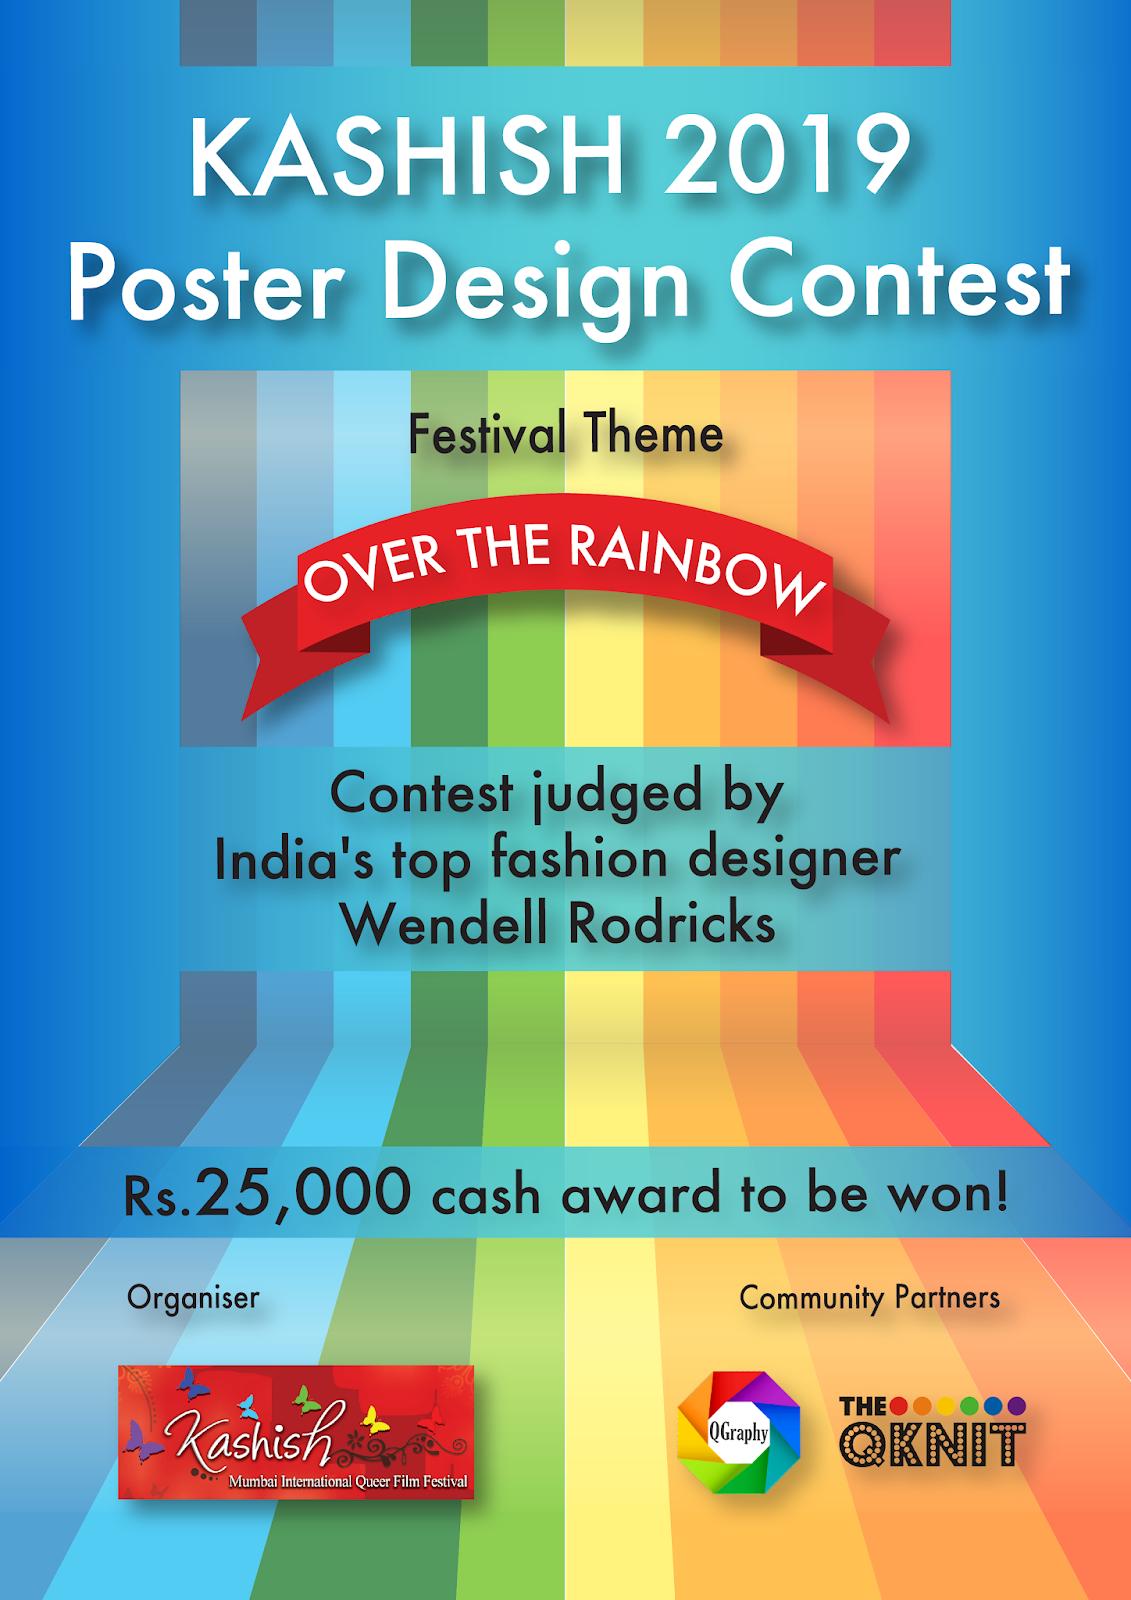 Kashish Mumbai International Queer Film Festival Kashish International Poster Design Contest 2019 Submission Call